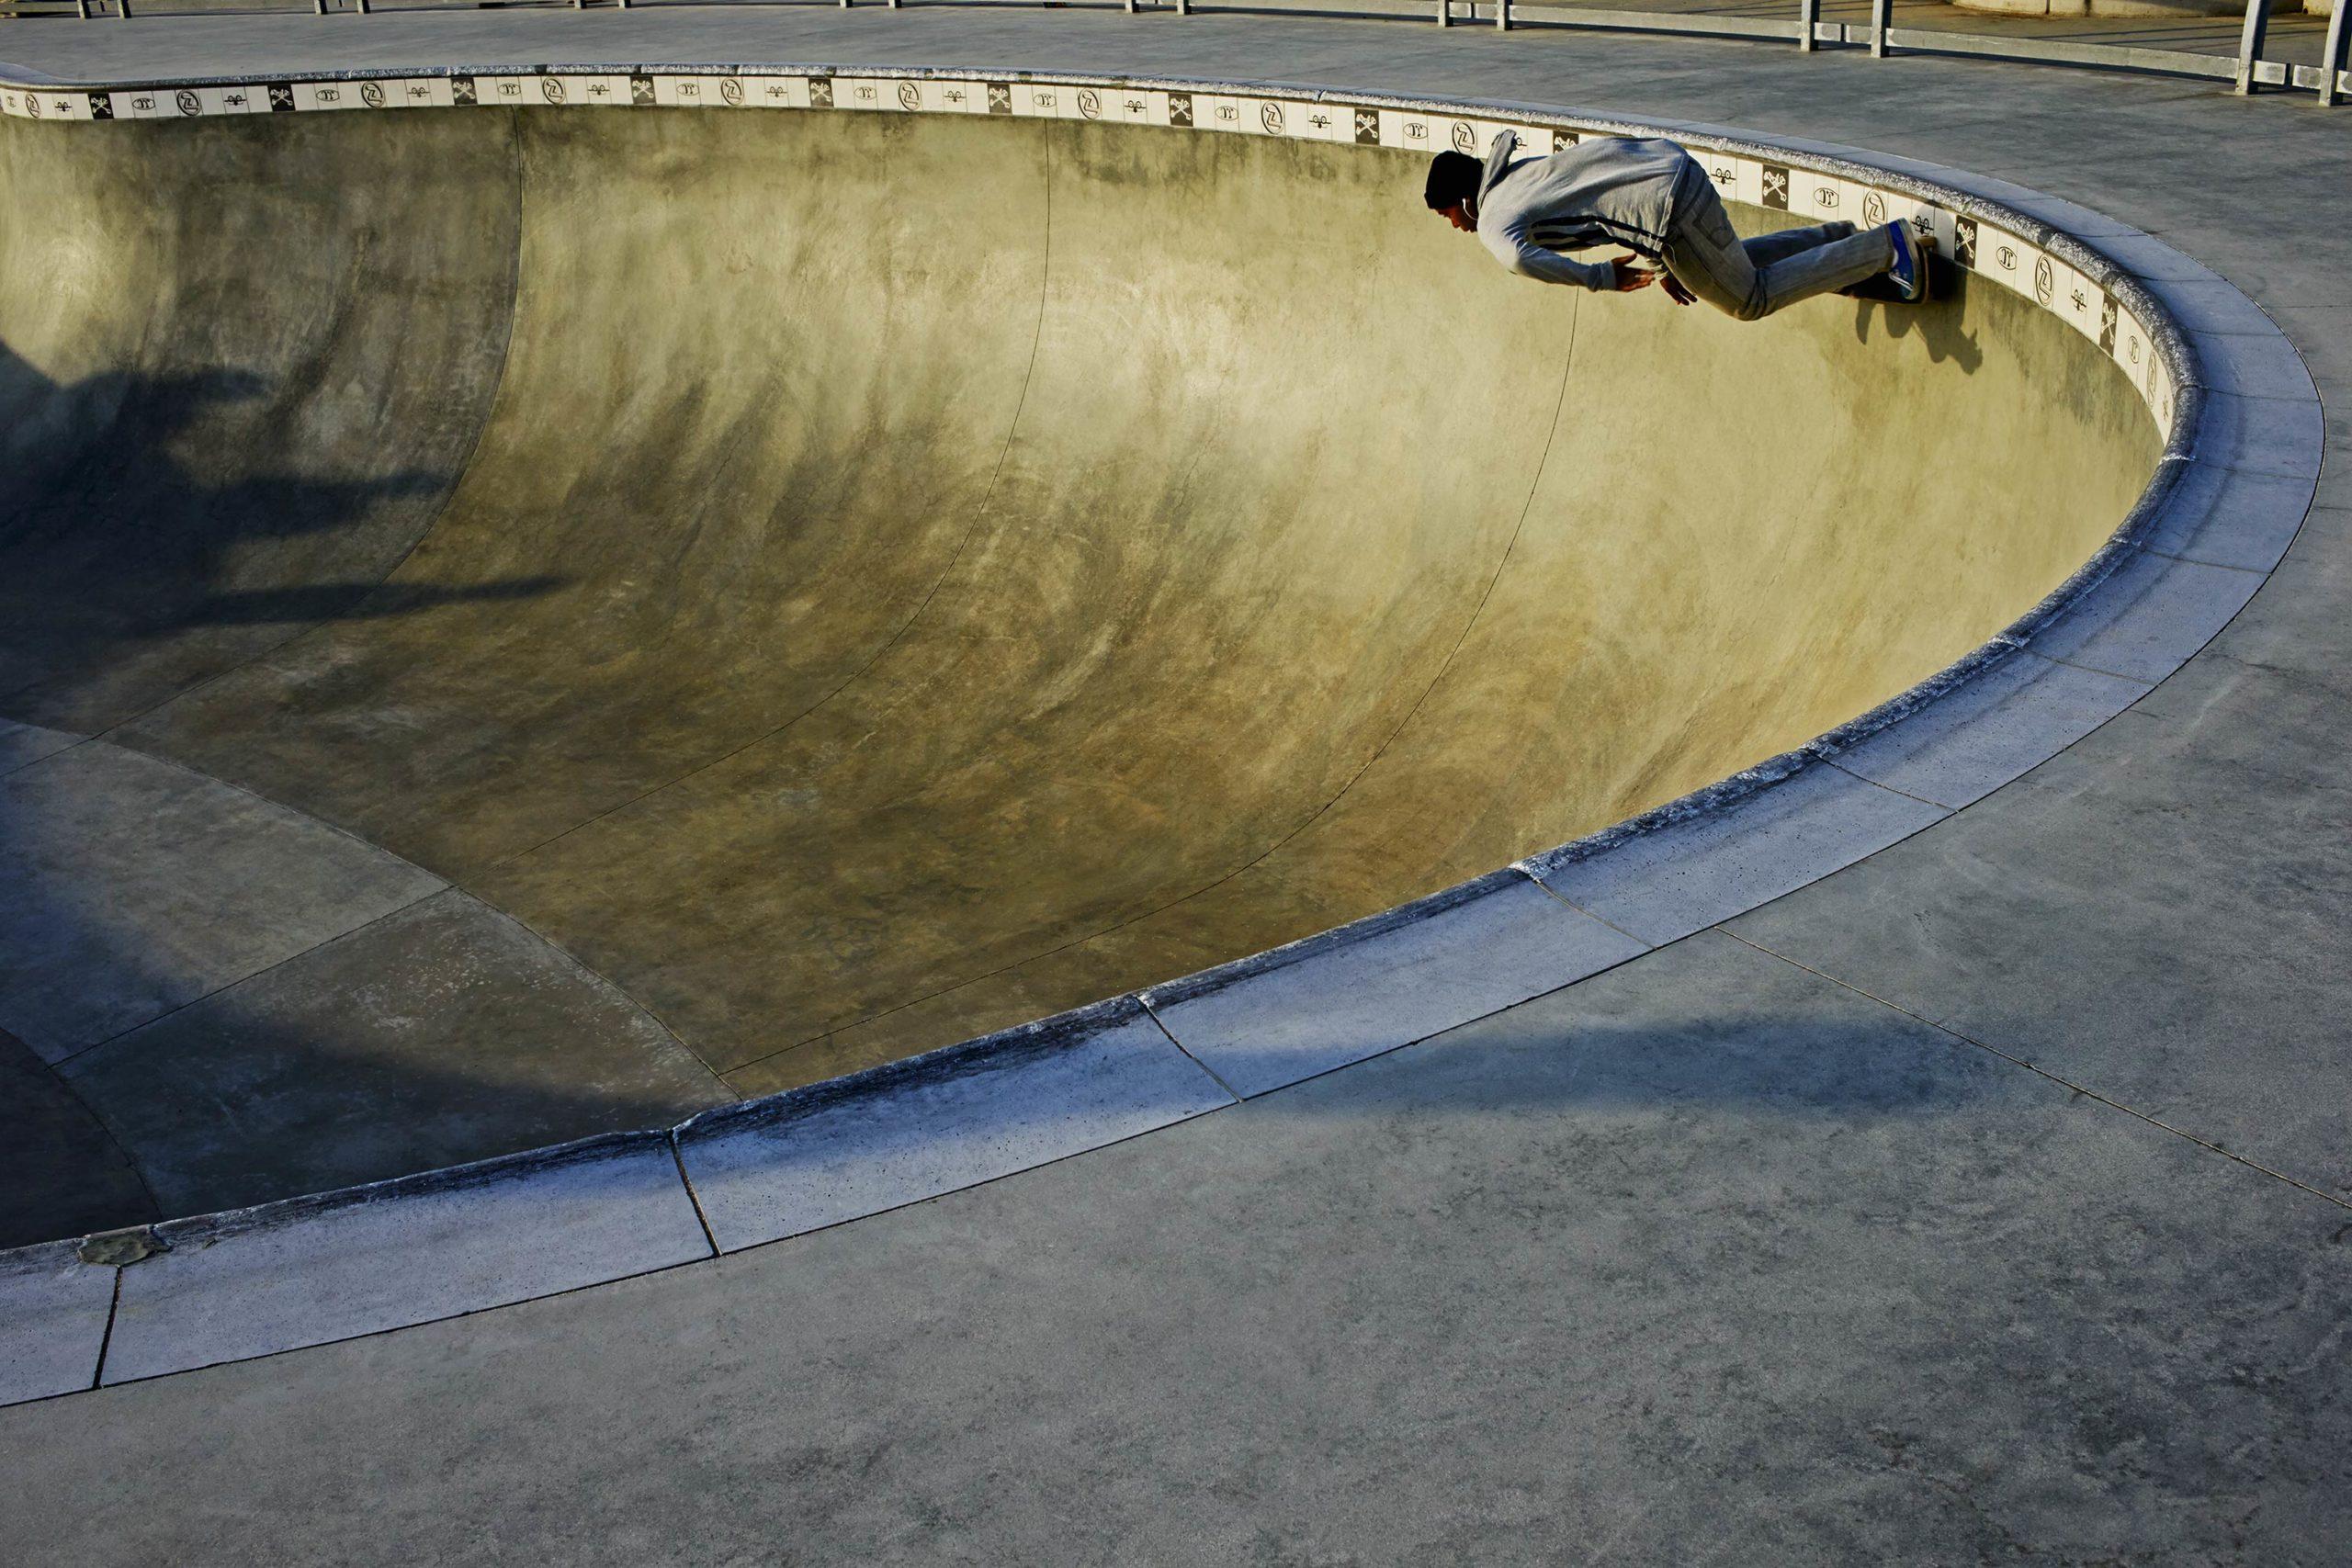 Blue Dream - Skate Park, Venice Beach Collection - Fine Art Photography by Toby Dixon